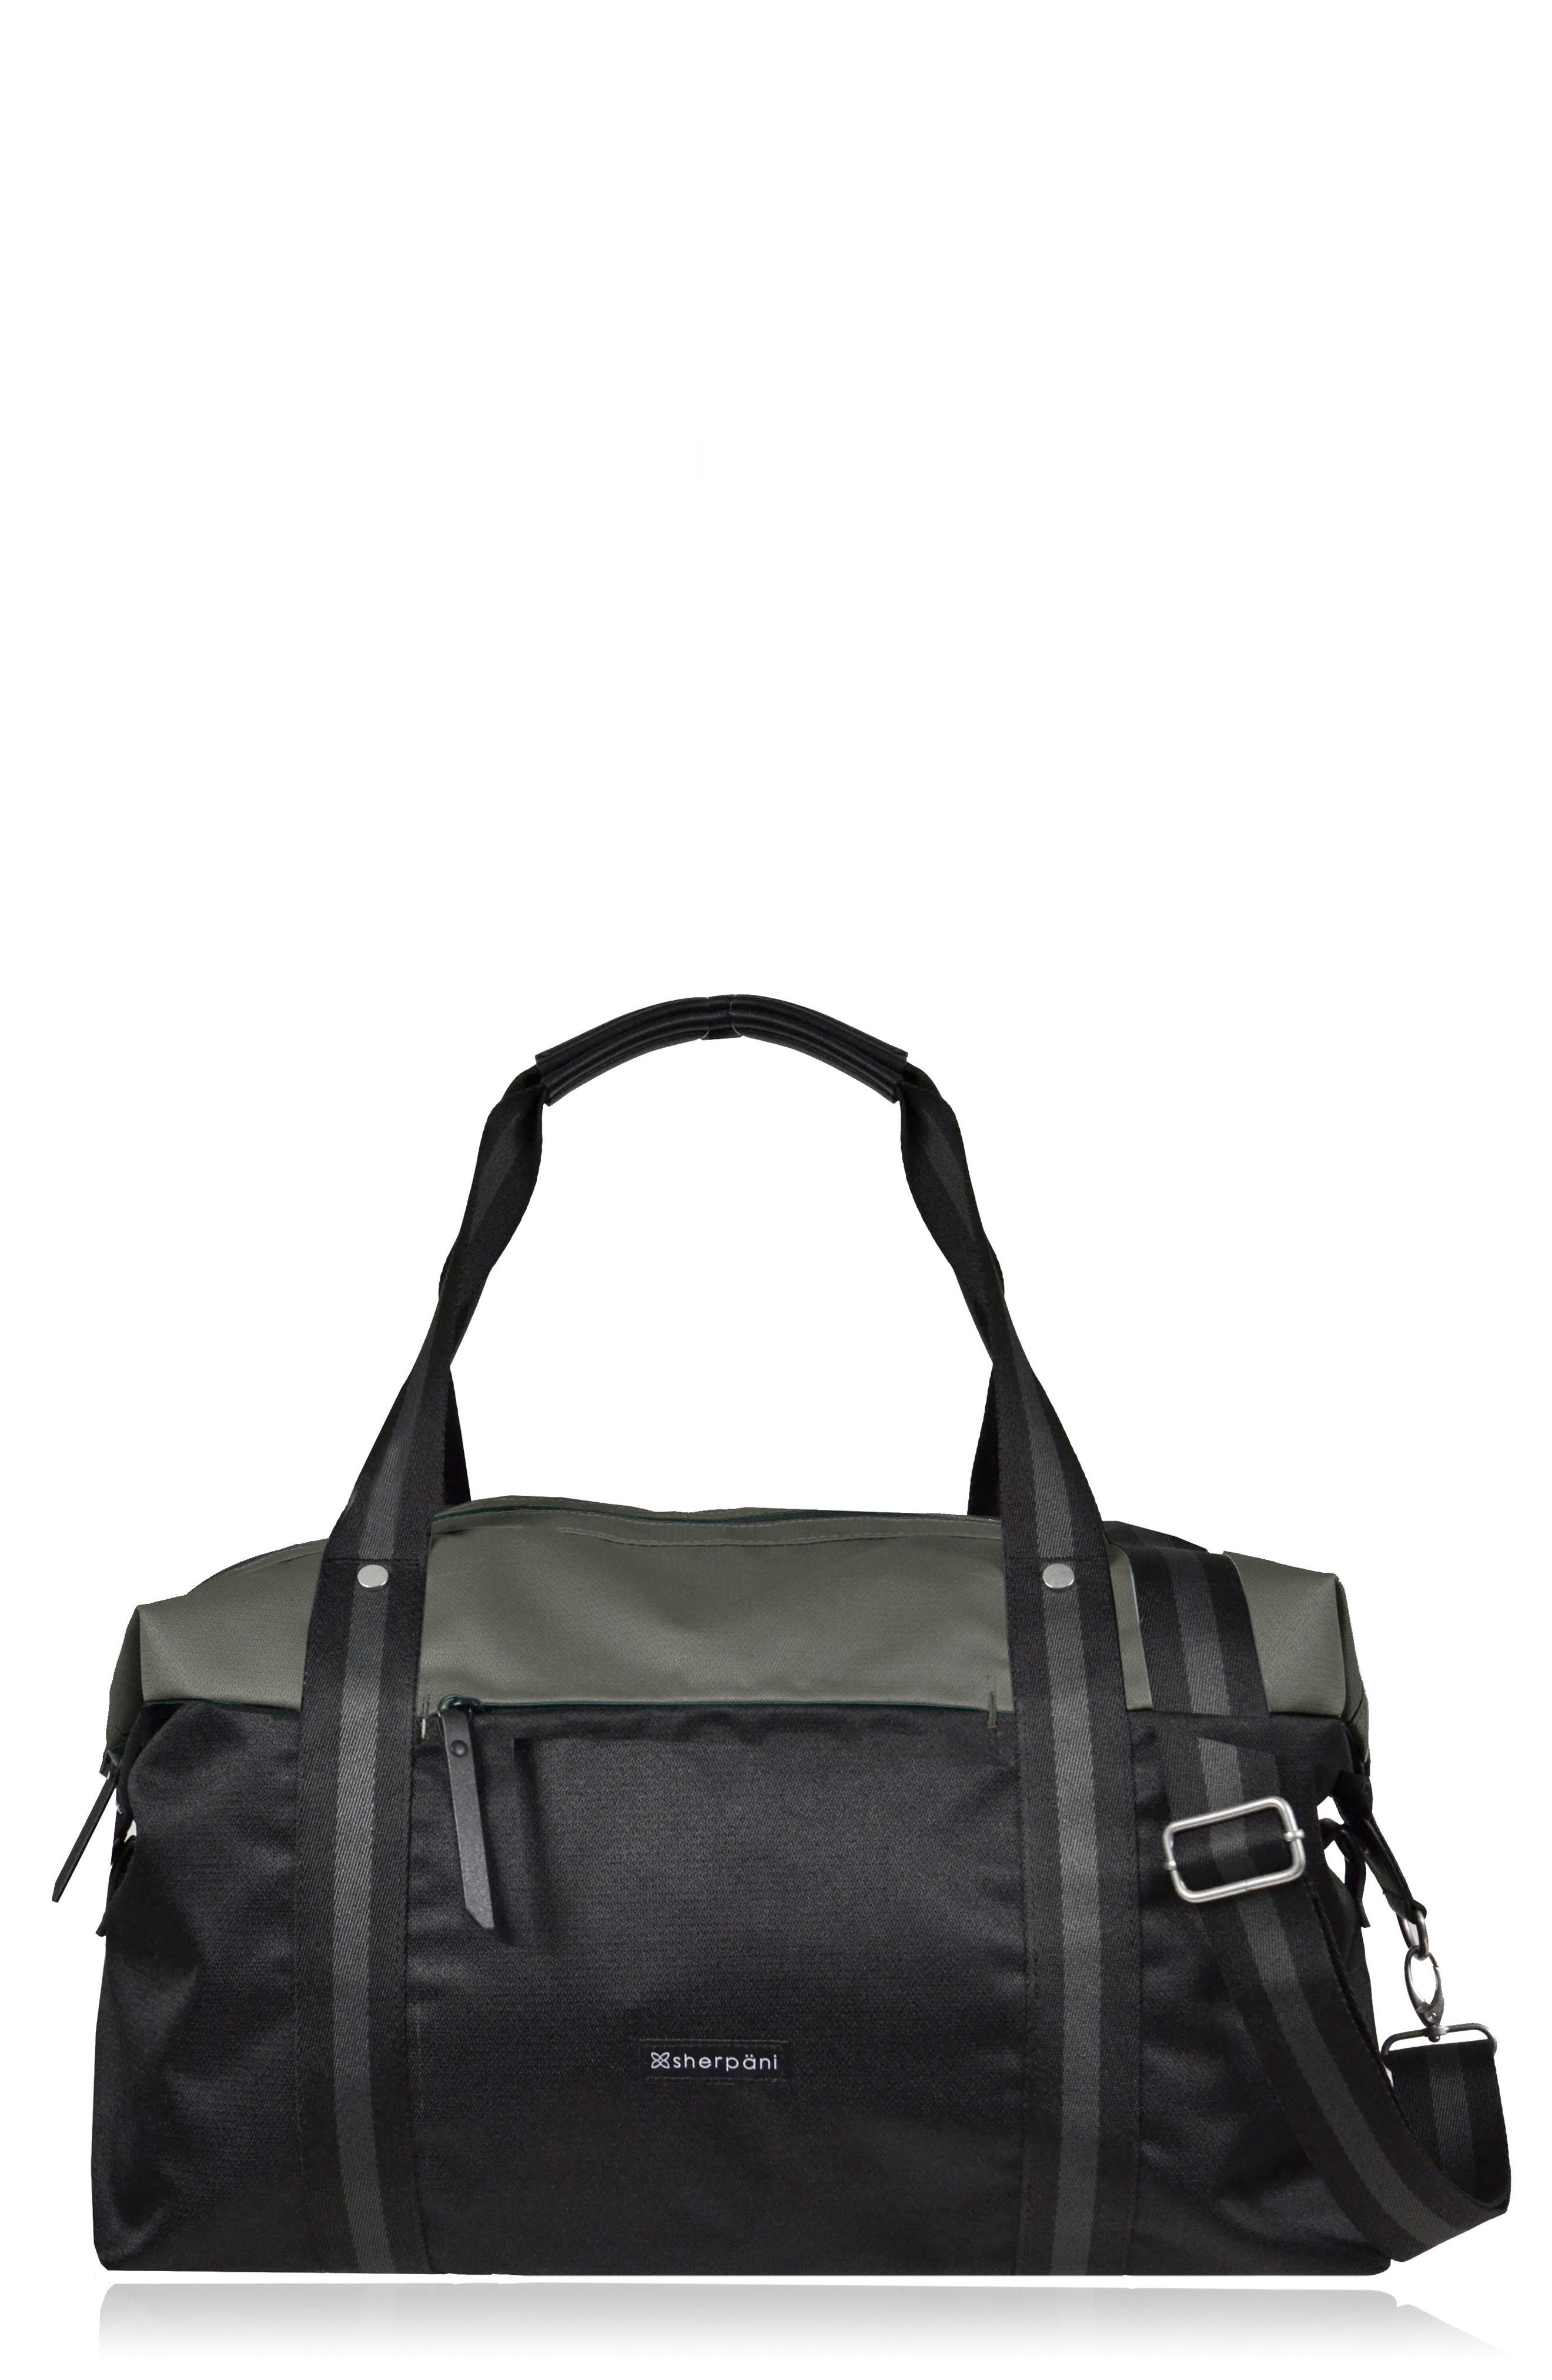 Sherpani Finn Overnighter Duffel Bag